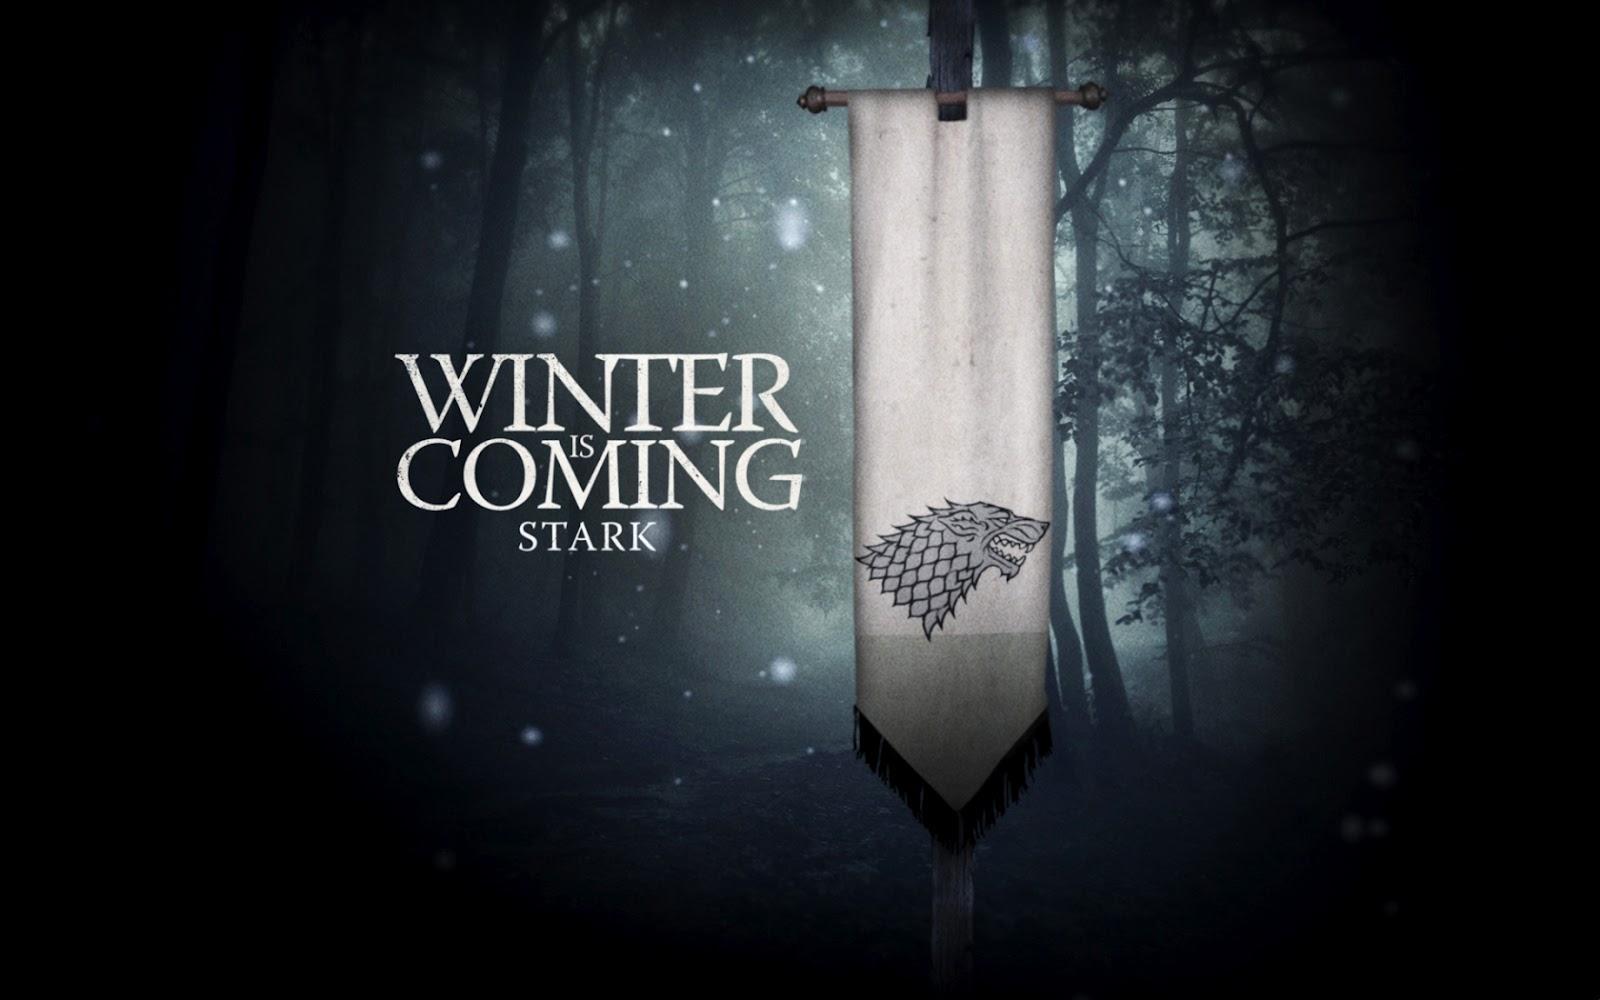 Game of Thrones Tv Episode HD Wallpapers Download Wallpapers in 1600x1000